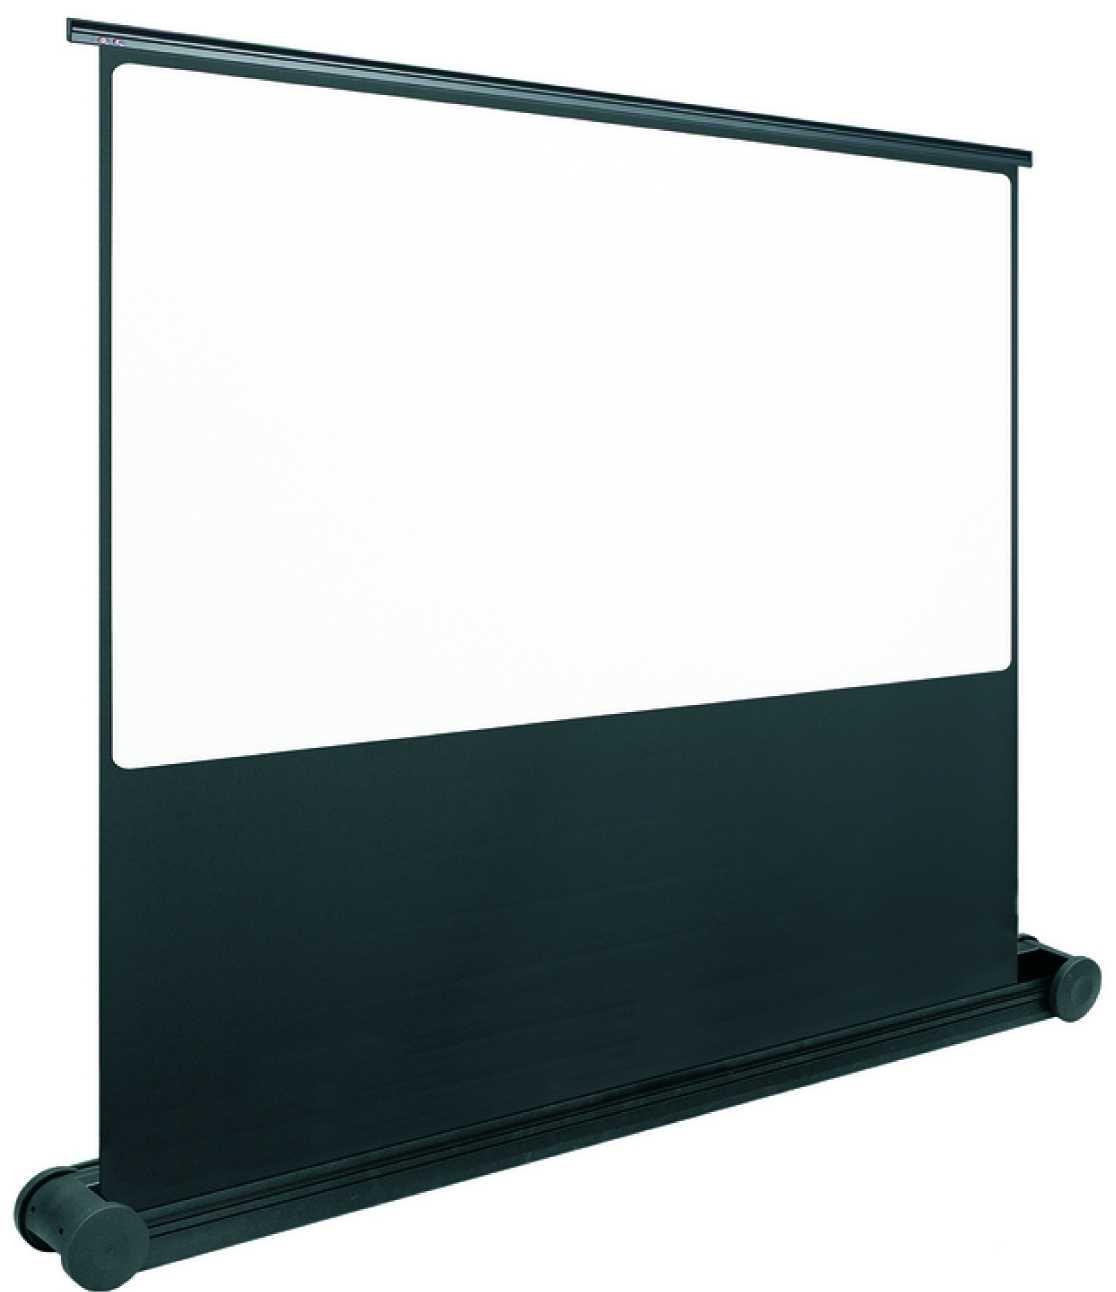 ecran de projection portable oray butterfly mobile 150x200 audiovisuel solution. Black Bedroom Furniture Sets. Home Design Ideas